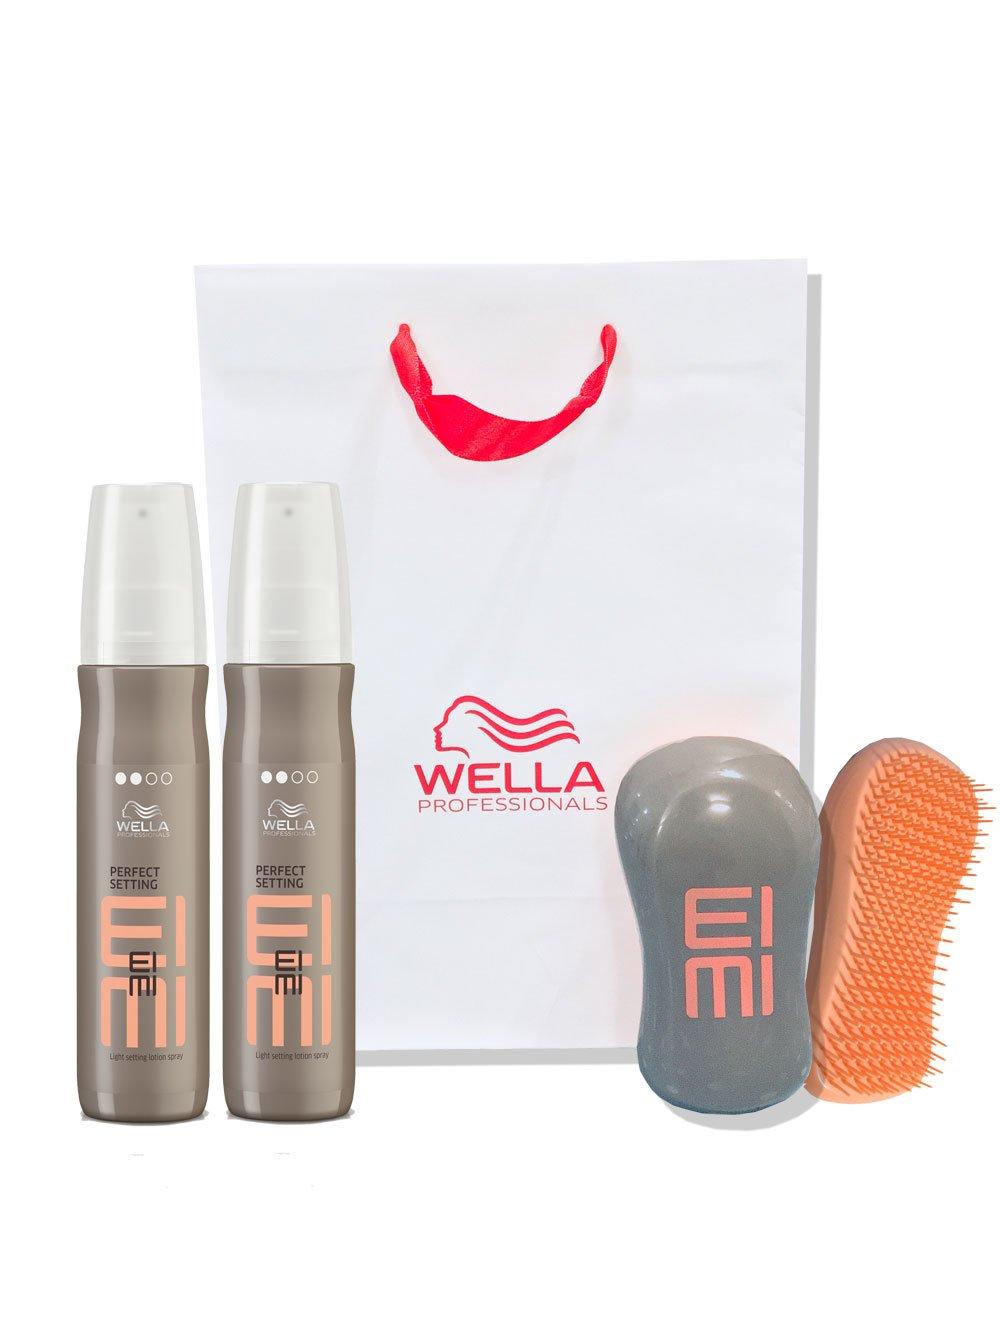 Wella Professionals Eimi Perfect Setting Setting Blow Dry Lotion Gift Set Wella Eimi